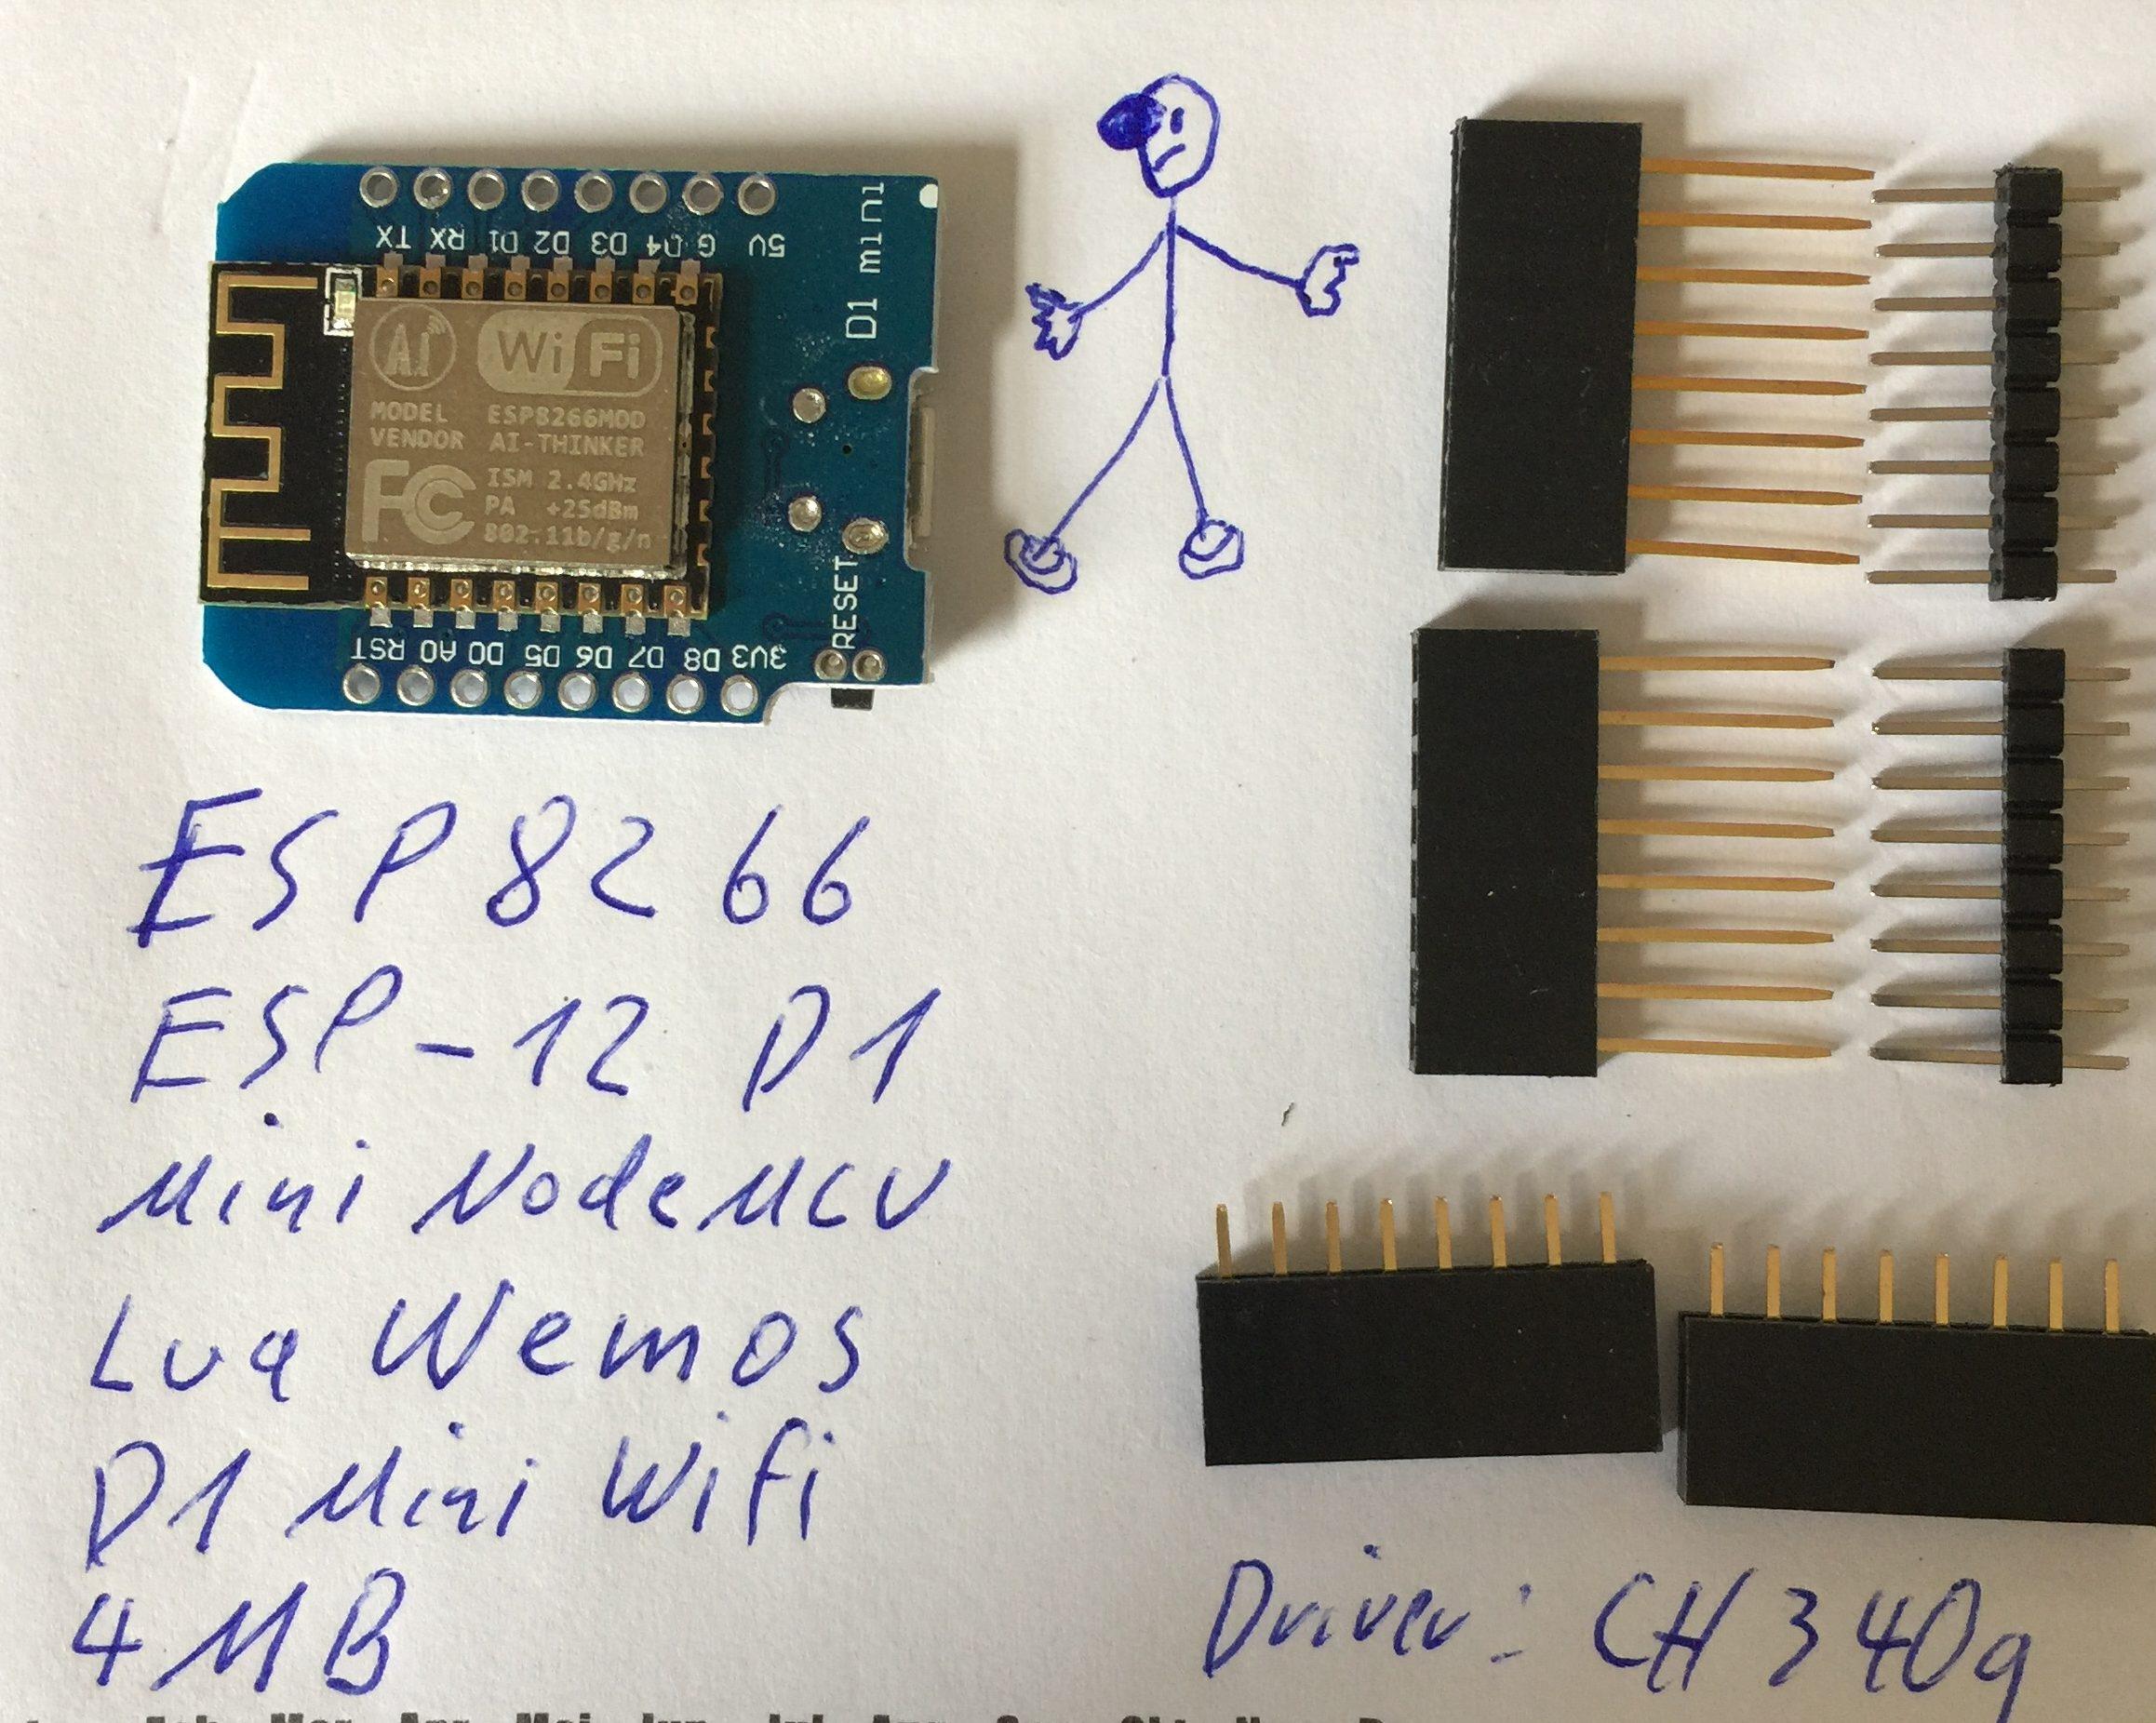 Wemo D1 ESP8266 Vorderseite